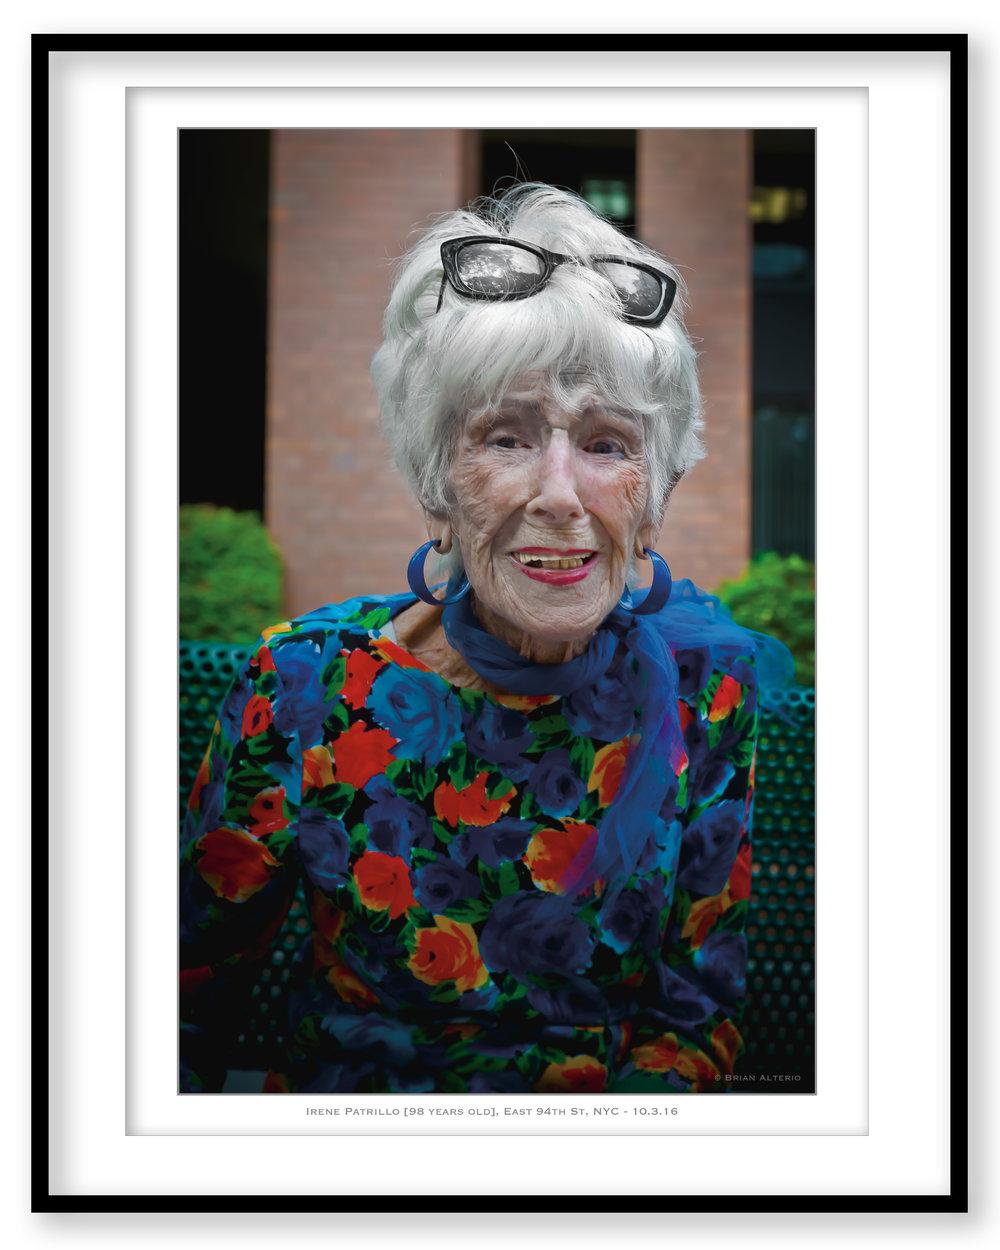 Irene Petrillo - 10.5.16.jpg